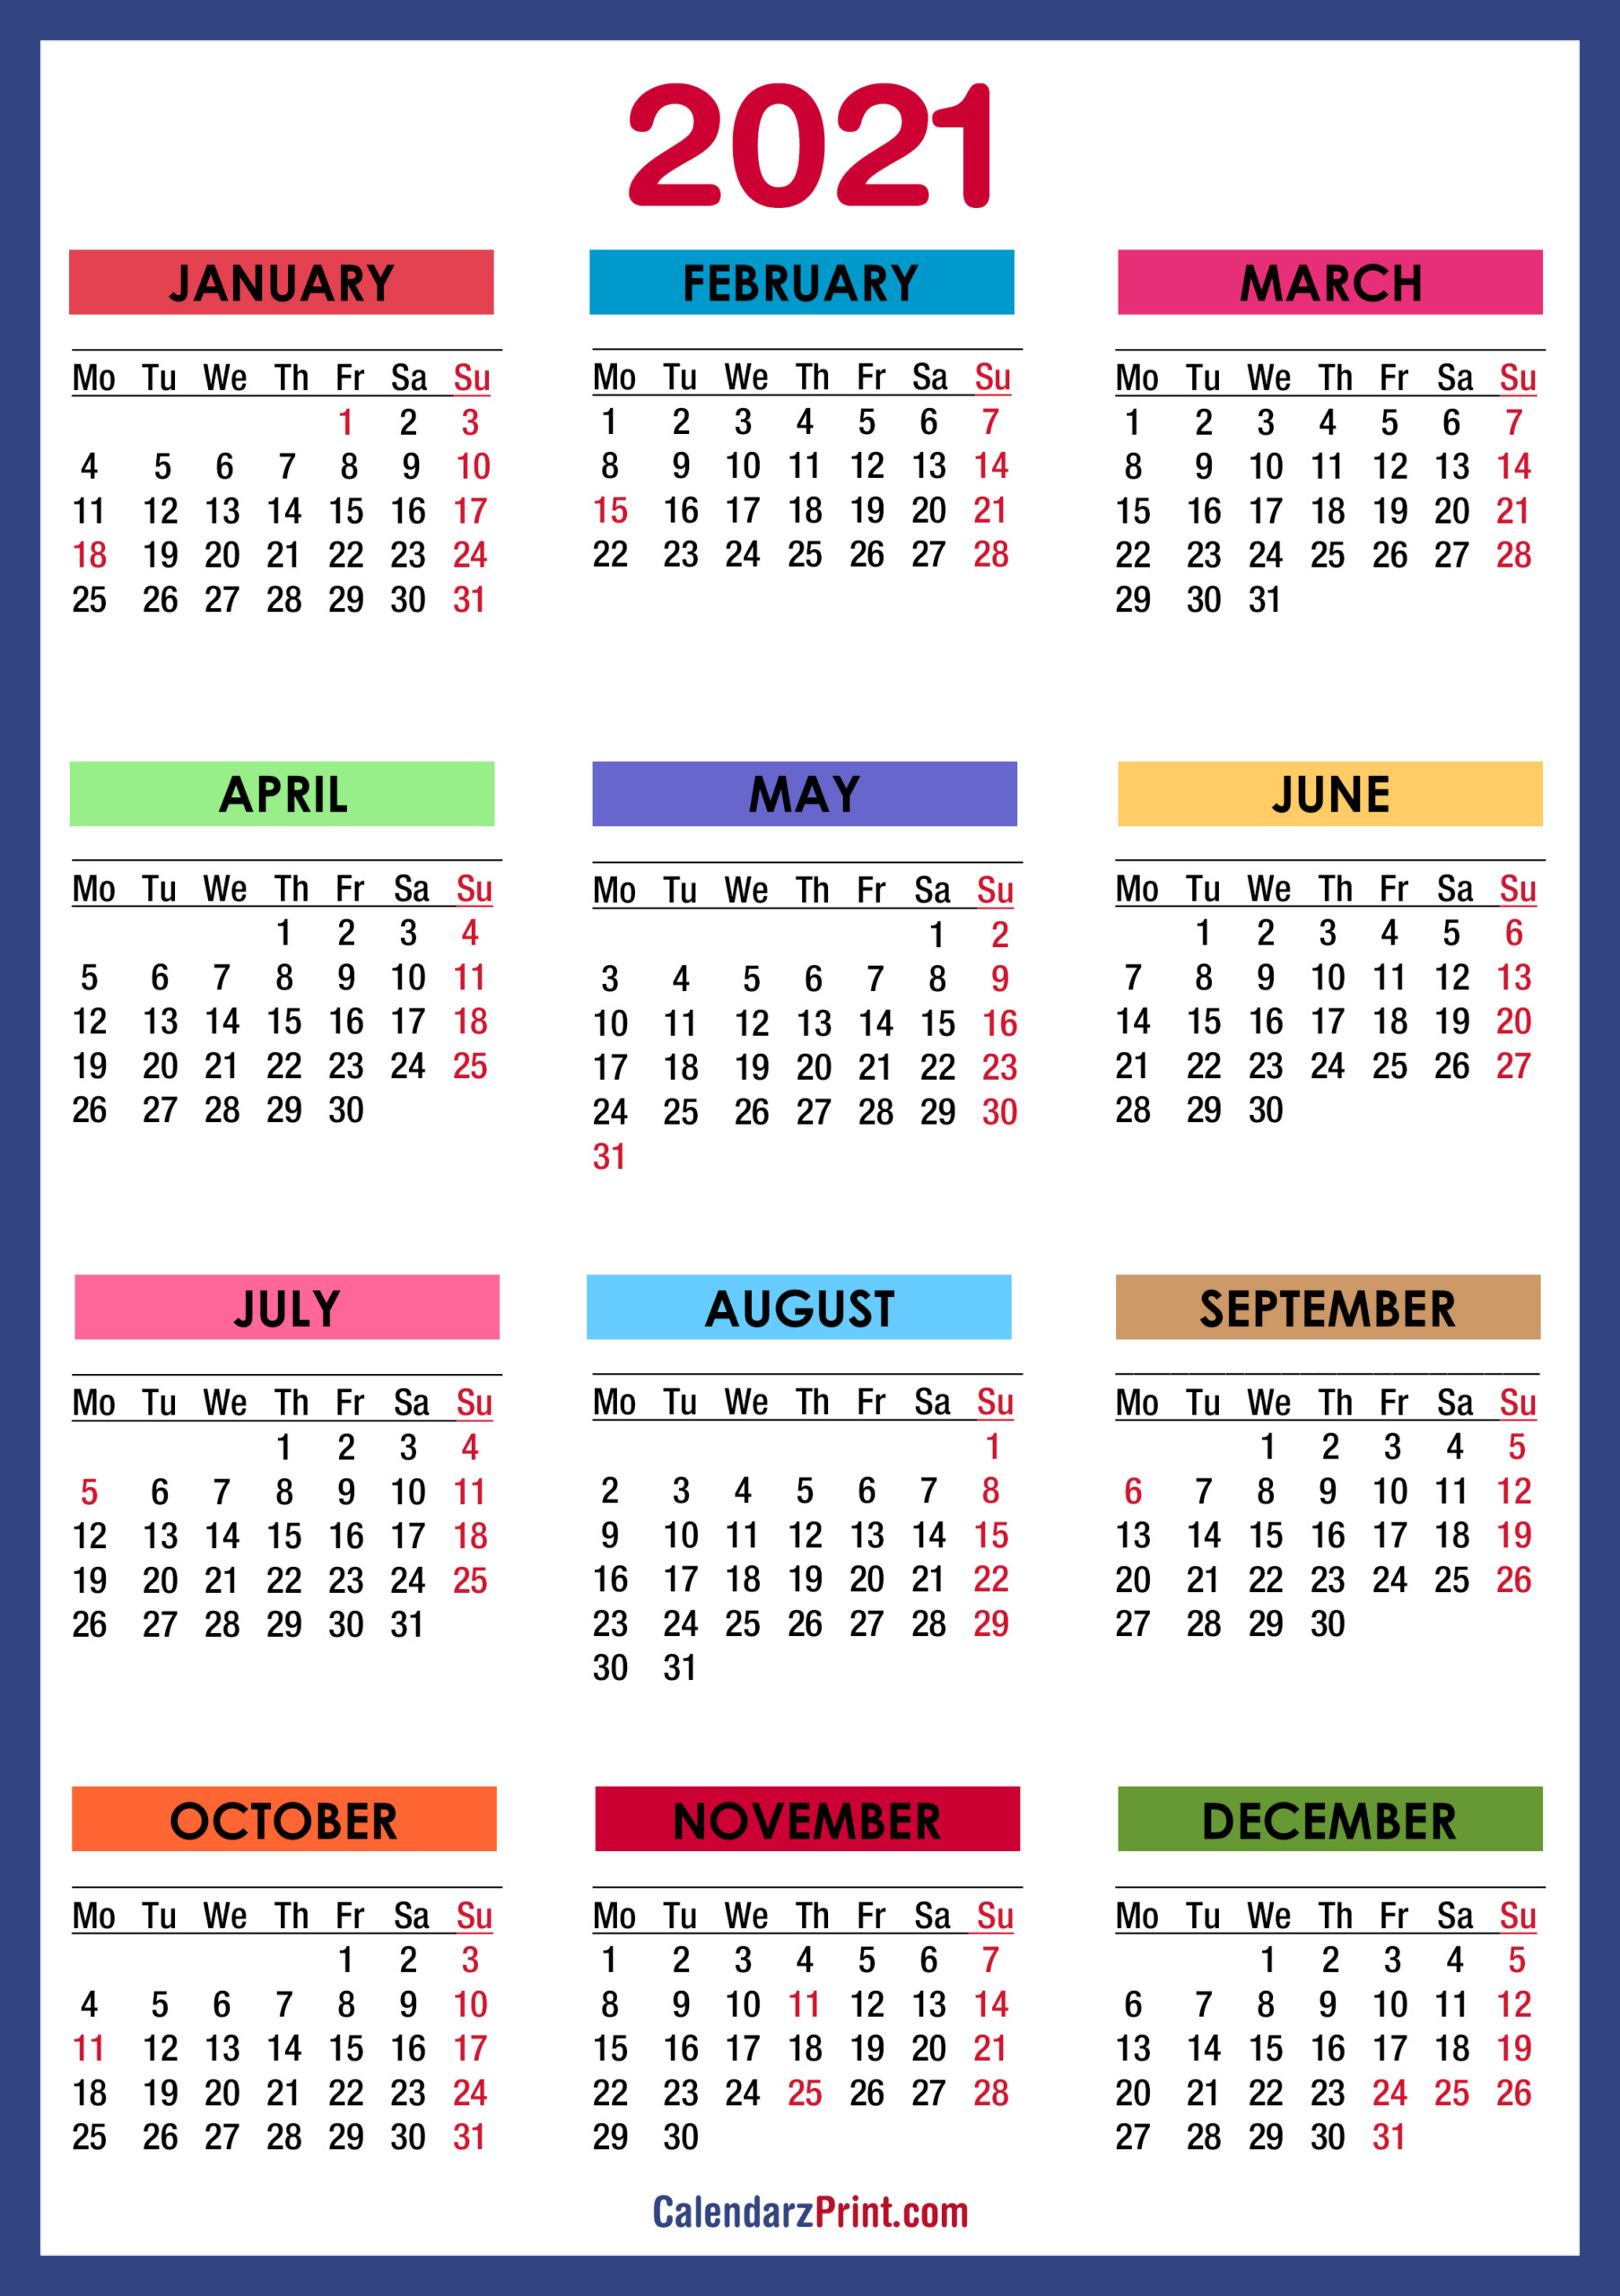 2021 Calendar With Us Holidays Printable Pdf   2021 Printable Calendars